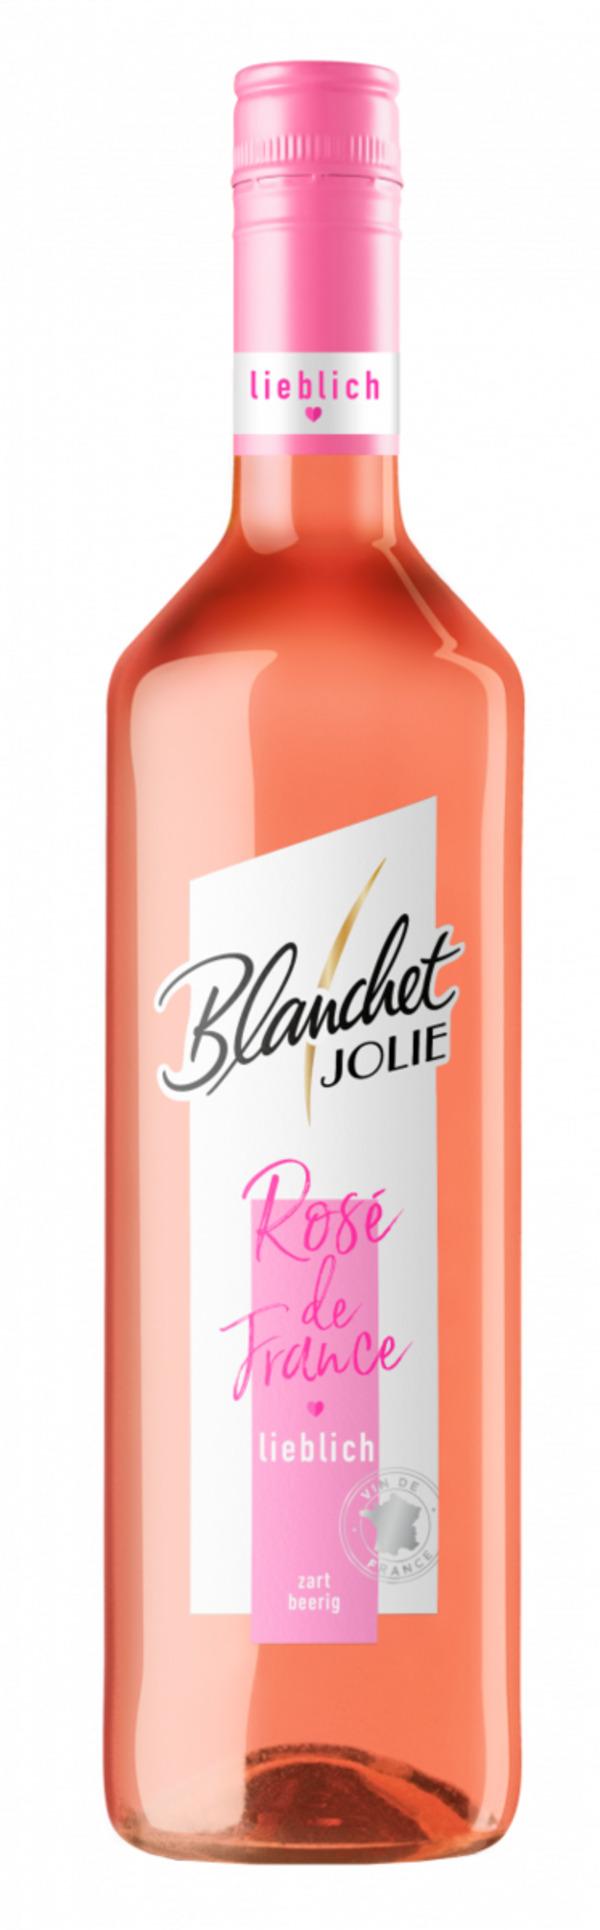 Blanchet Jolie Rosé de France, Lieblich